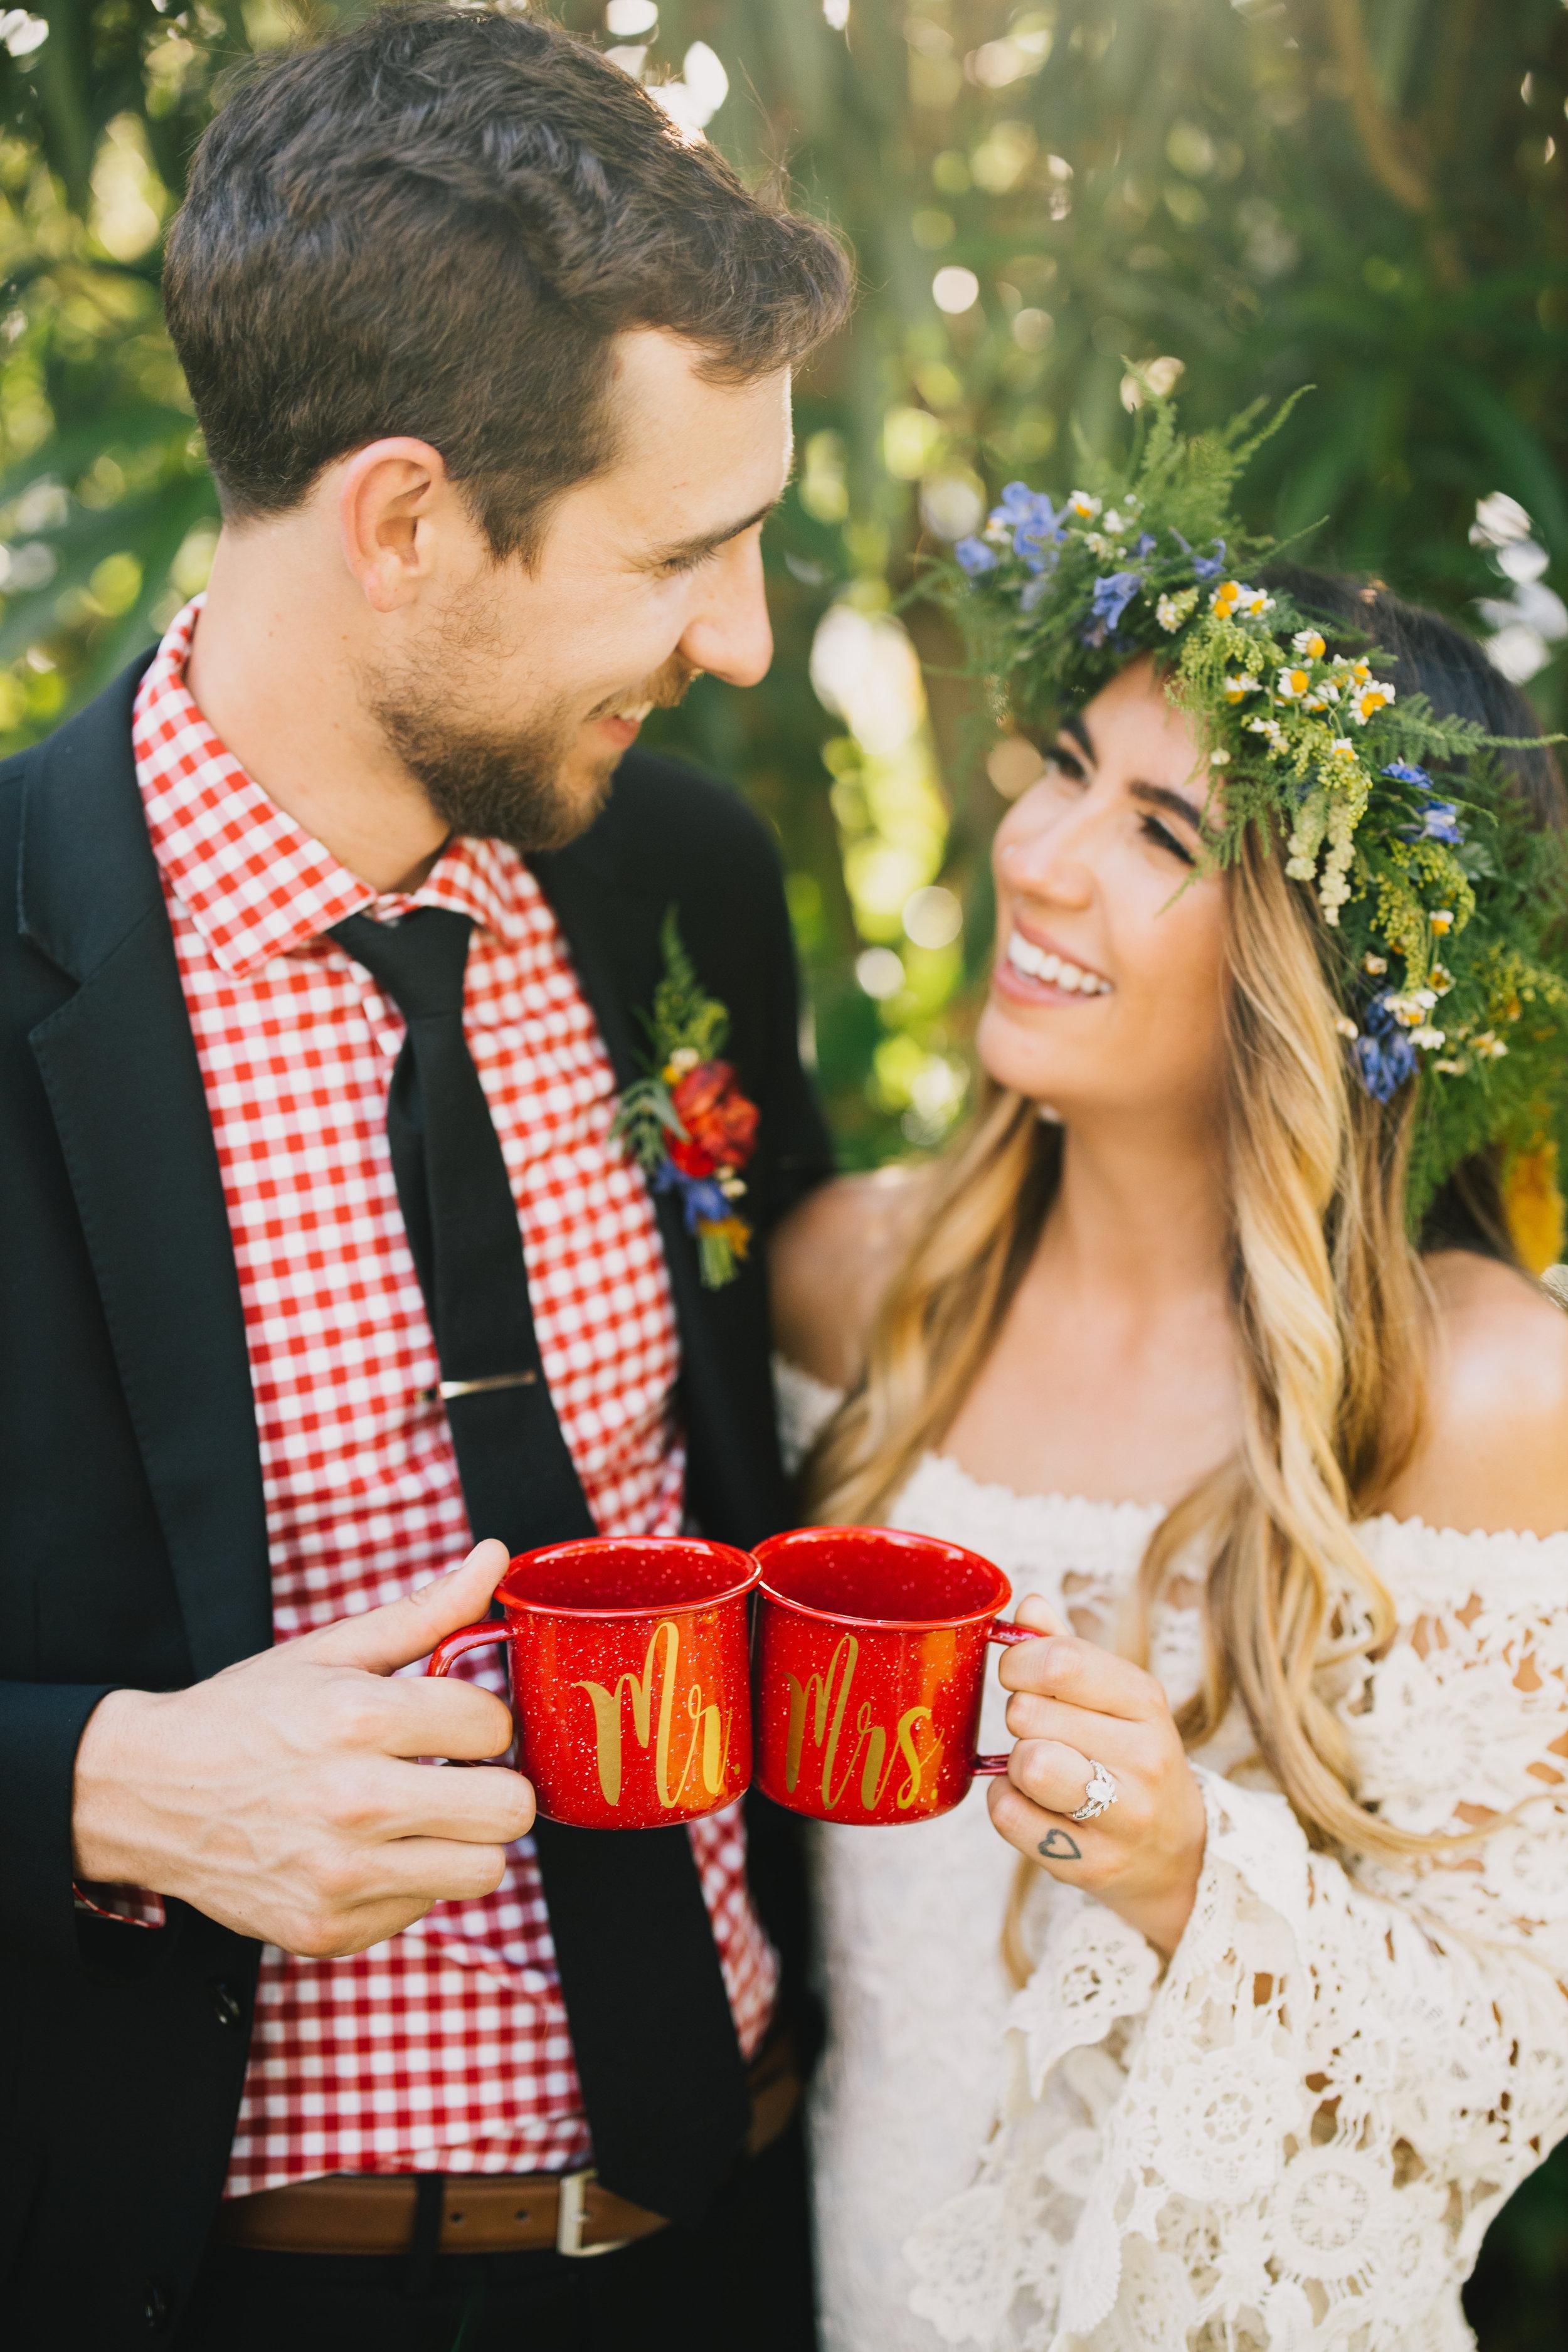 B_R_weddingdayhighlights_JNP-189.jpg